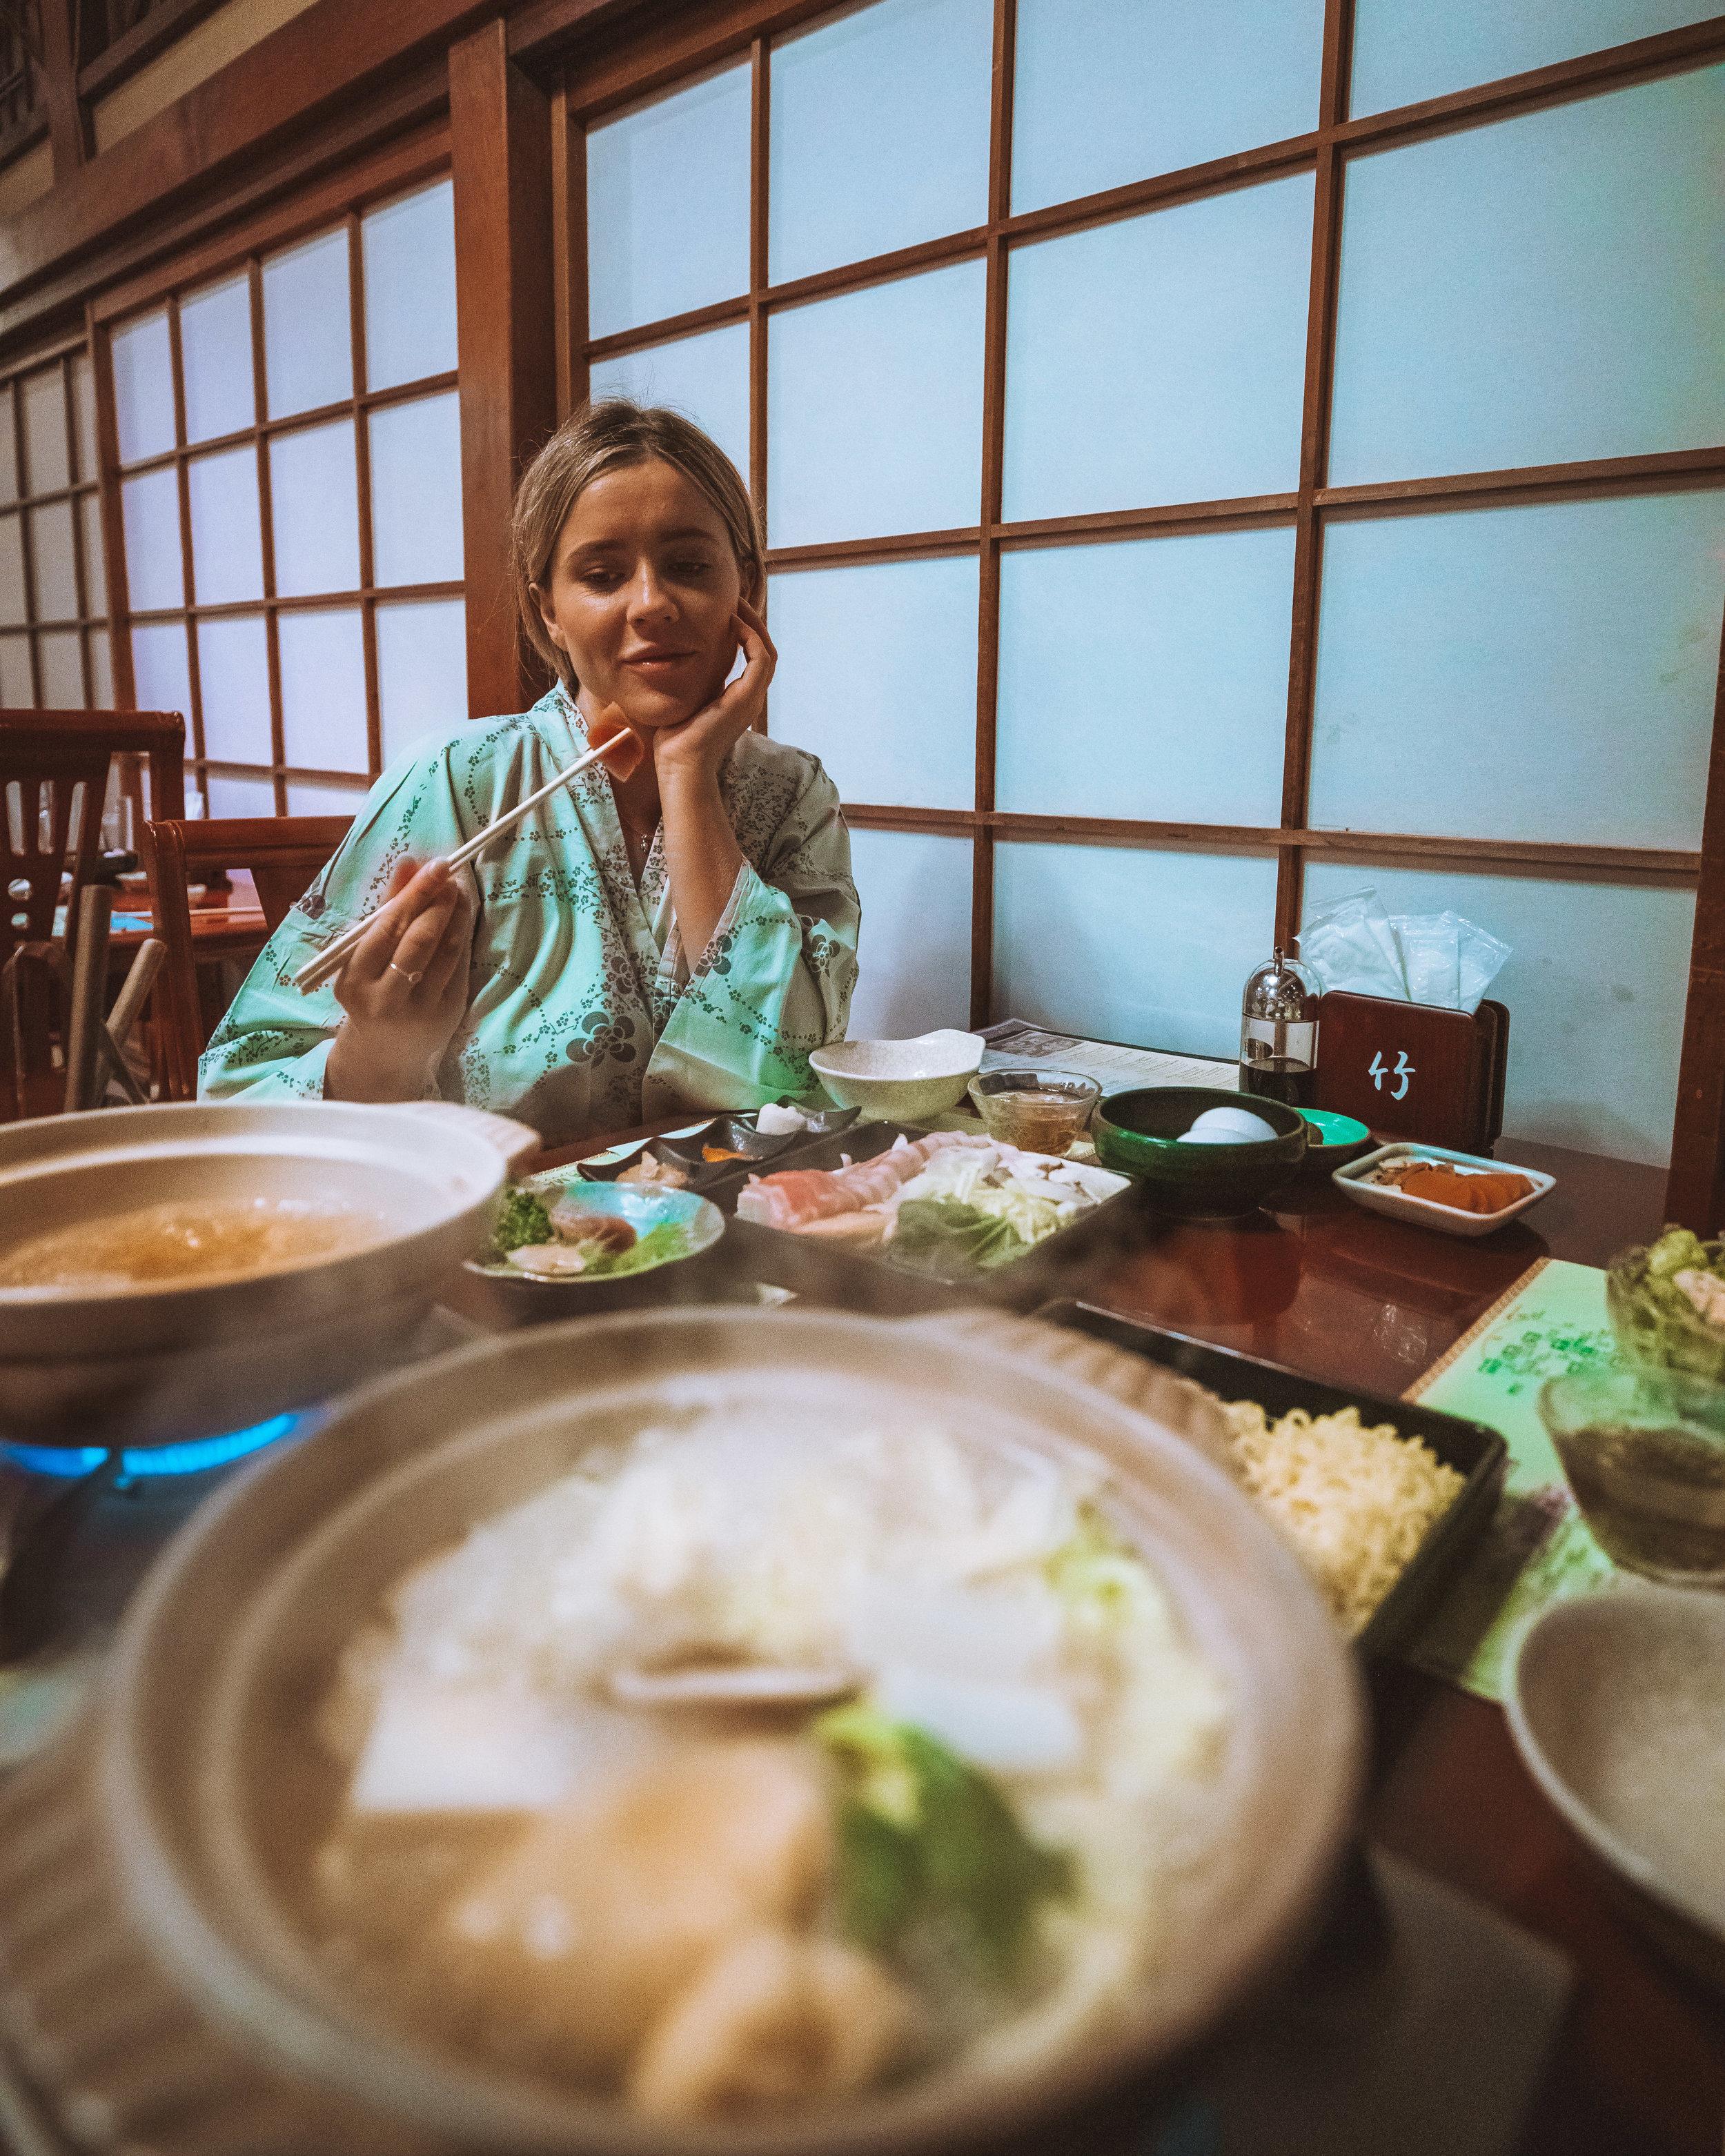 Enjoying our Kaiseki dinner at our Ryokan home